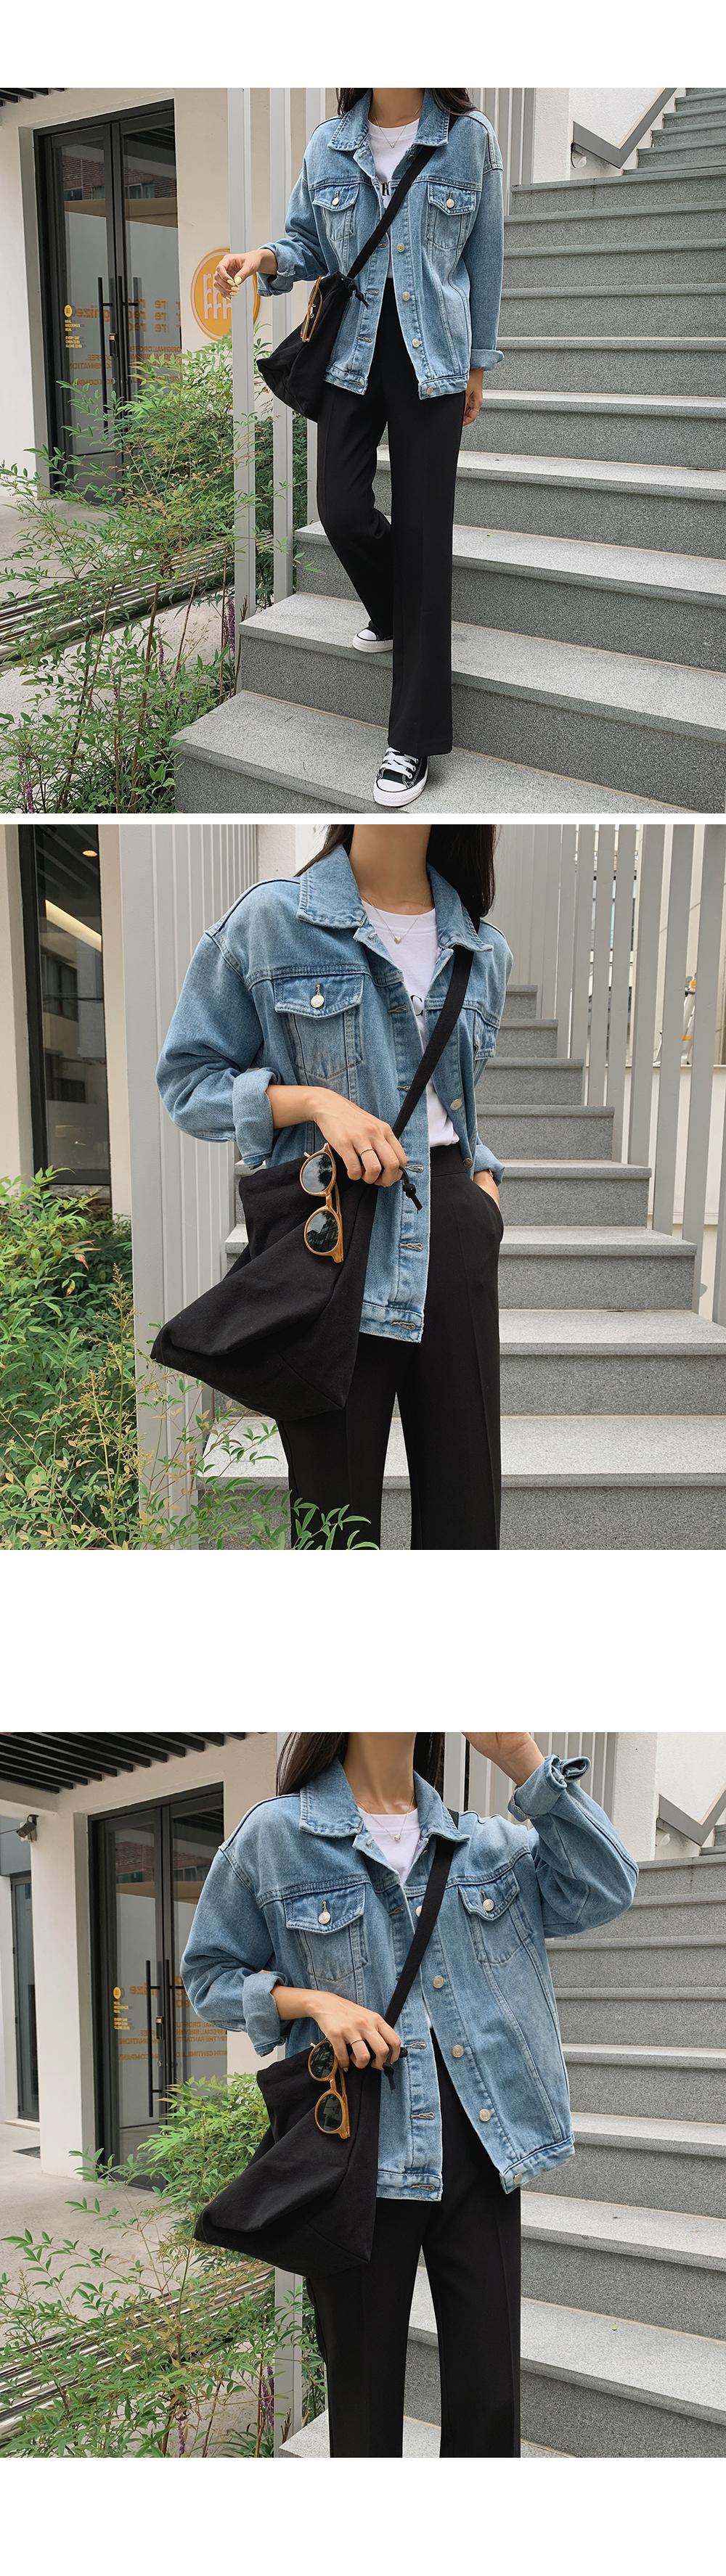 Medium Wash Denim Hood Jacket-holiholic.com